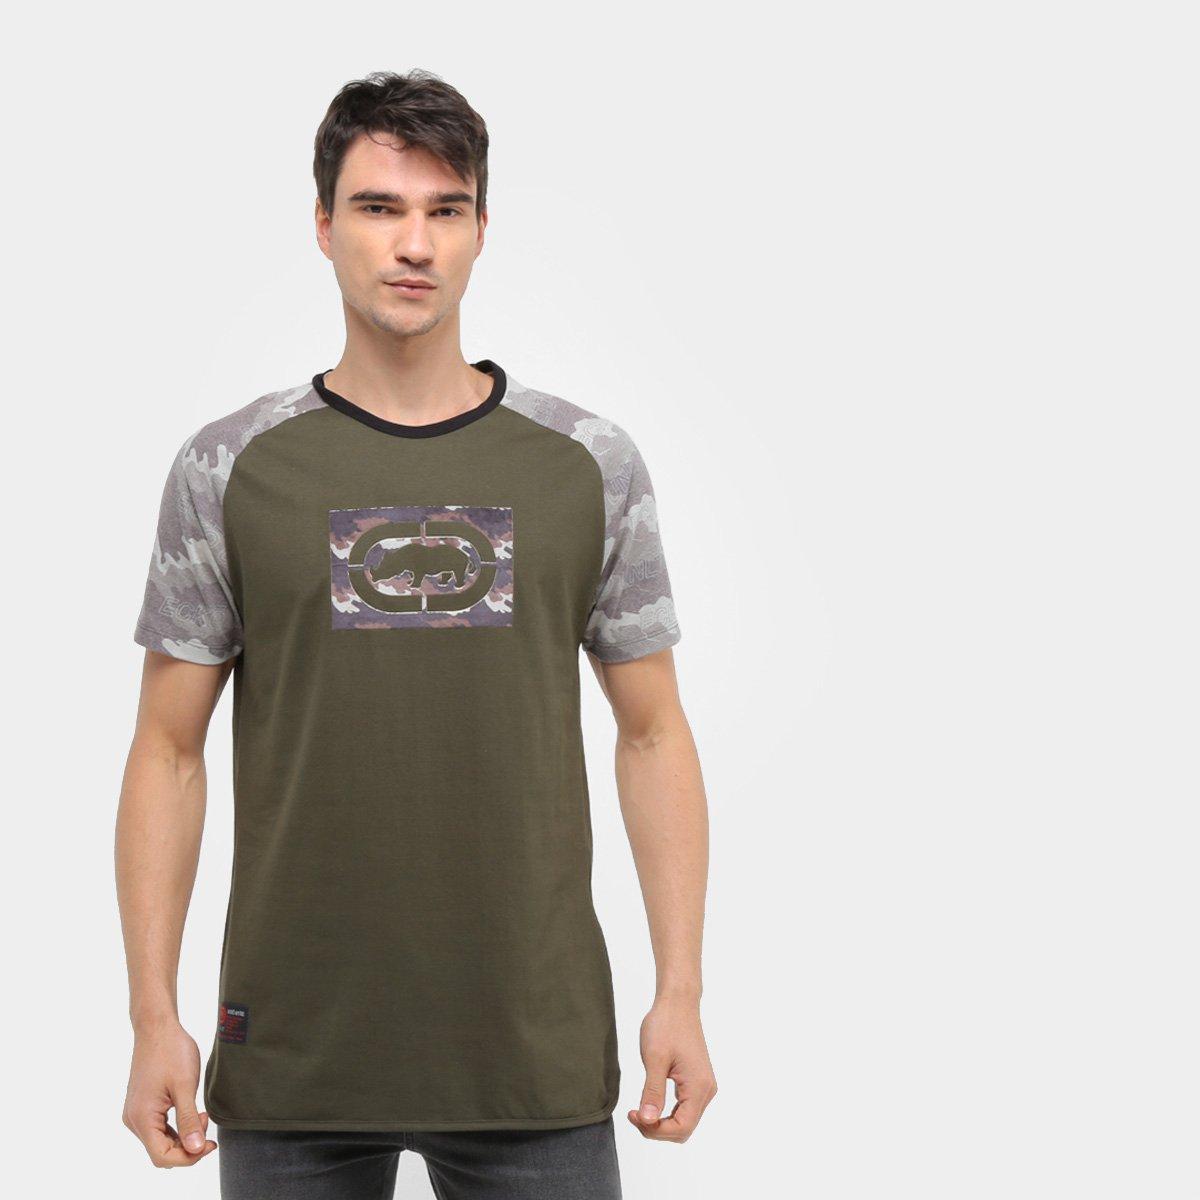 Camiseta Ecko Unltd Camuflada Rhino Masculina